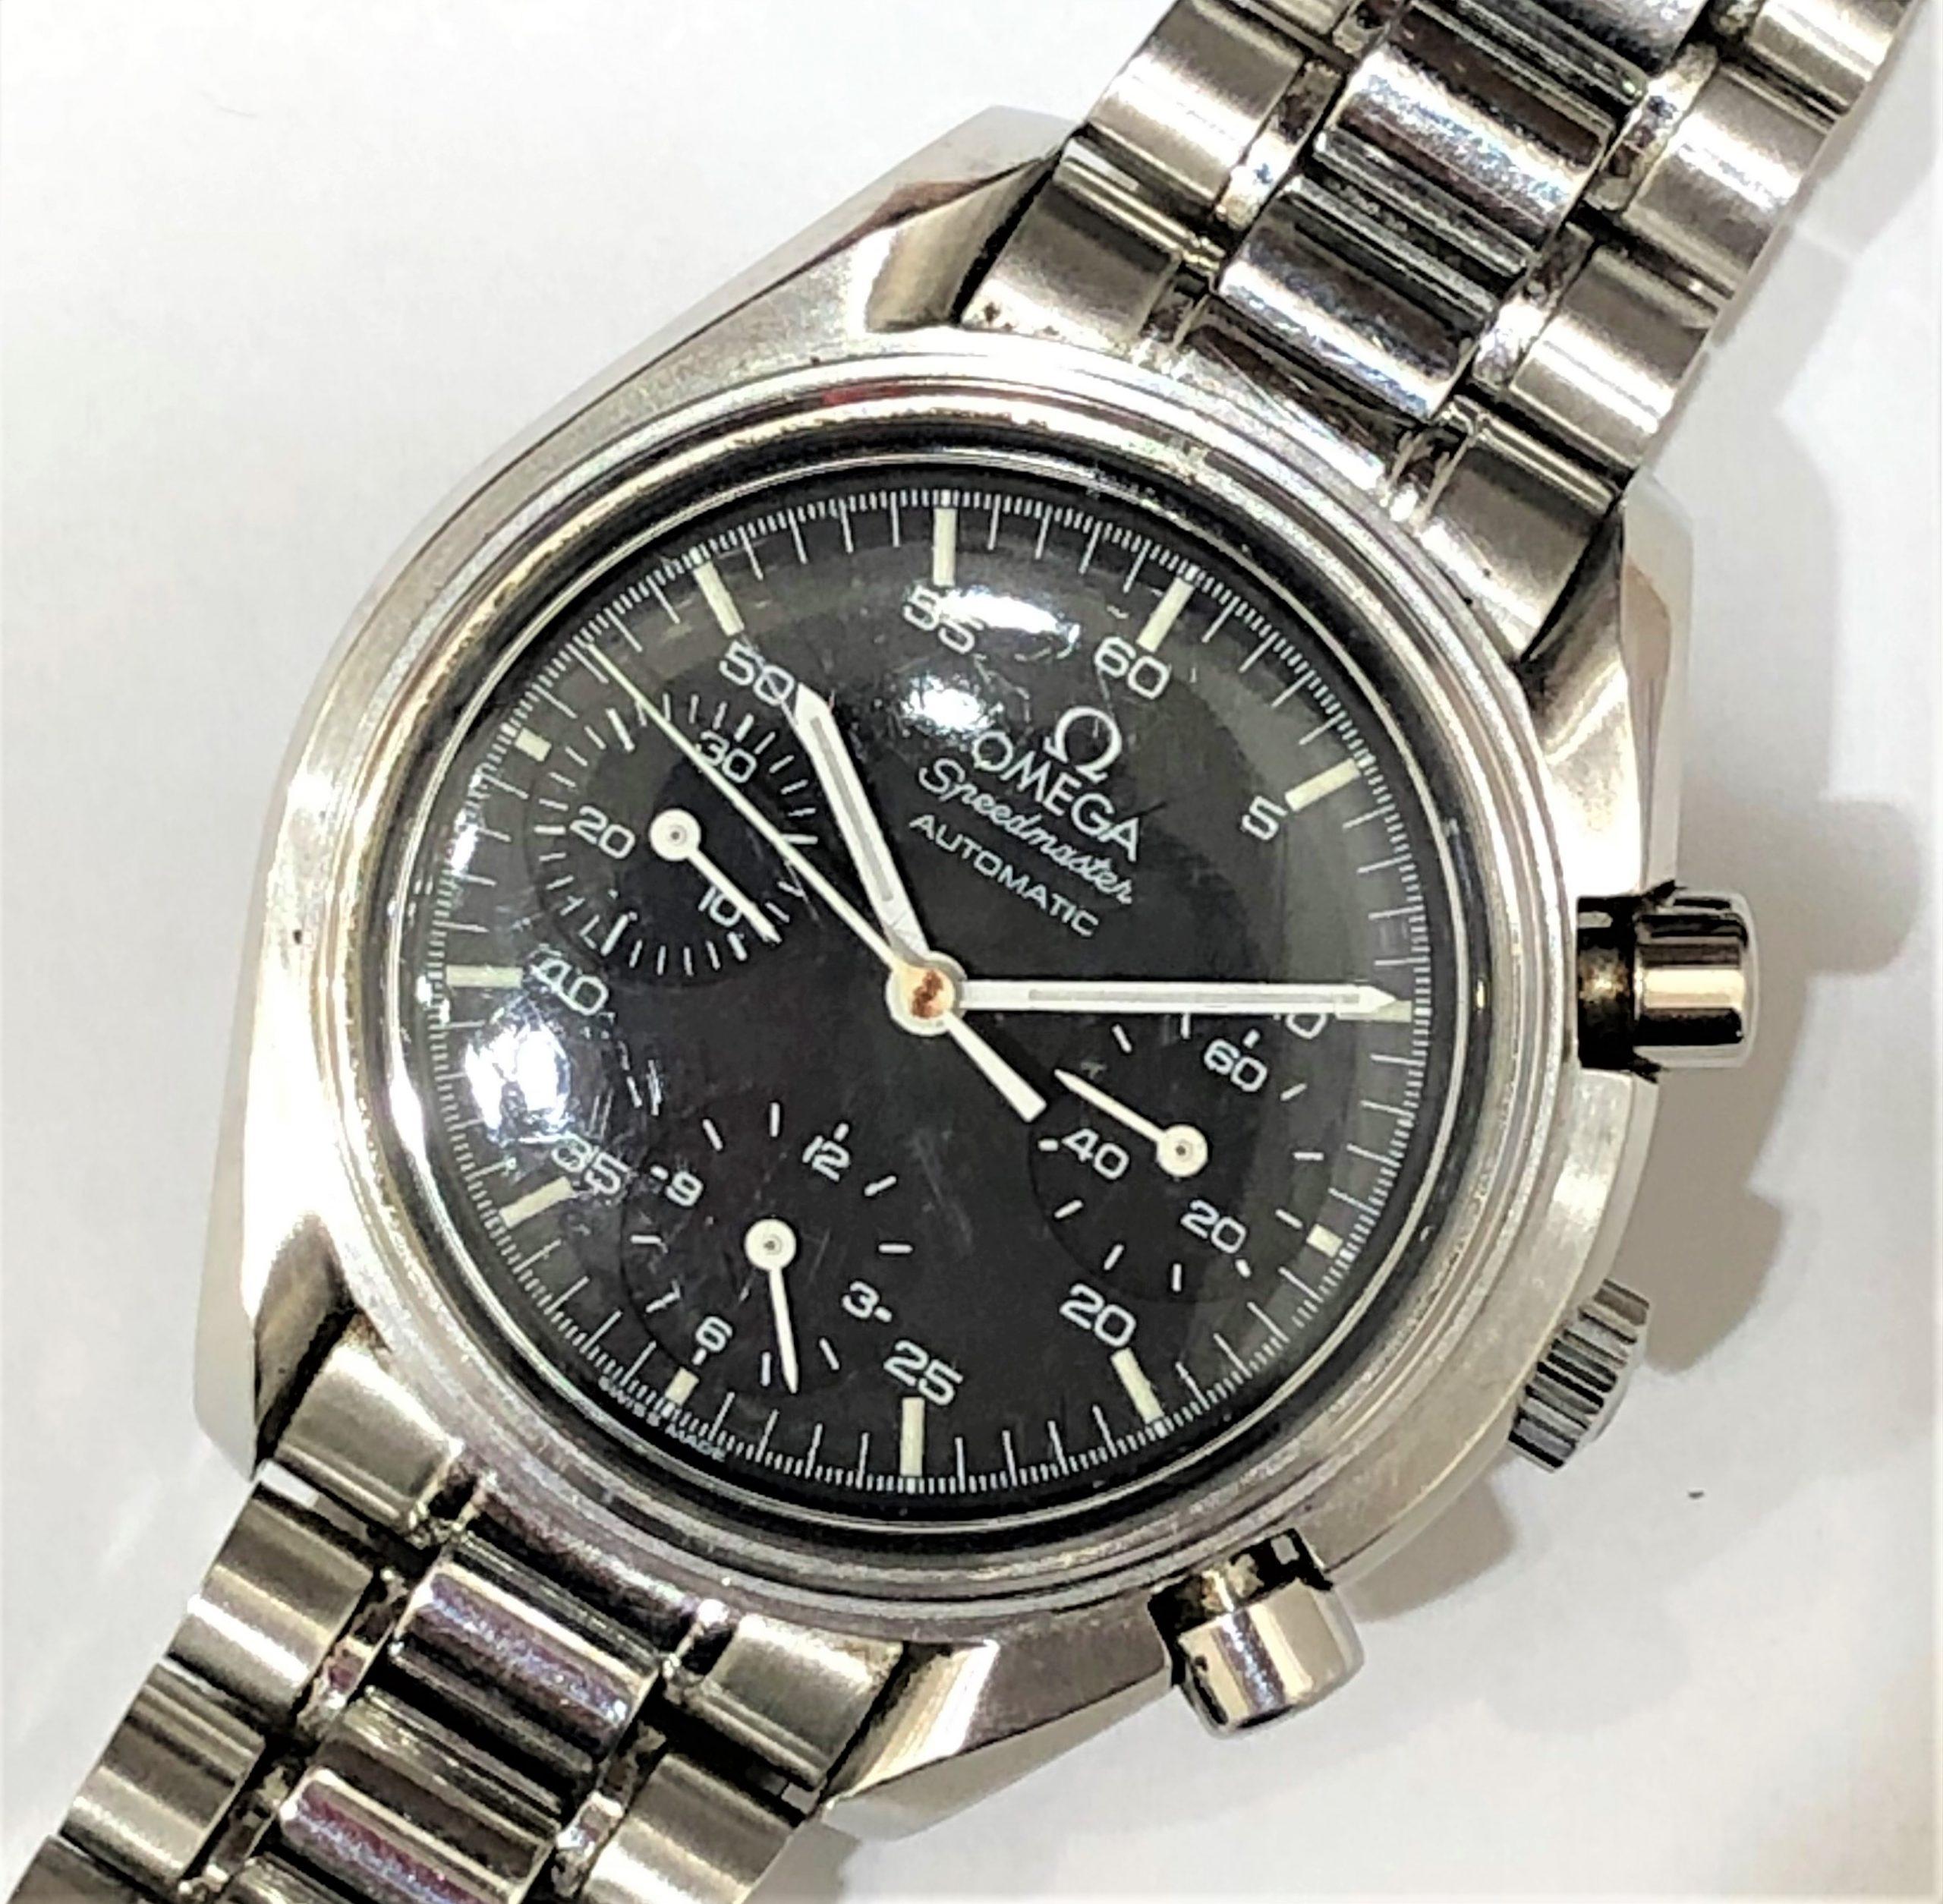 【OMEGA/オメガ】スピードマスター 3510.50 AT 腕時計 ベゼル欠損